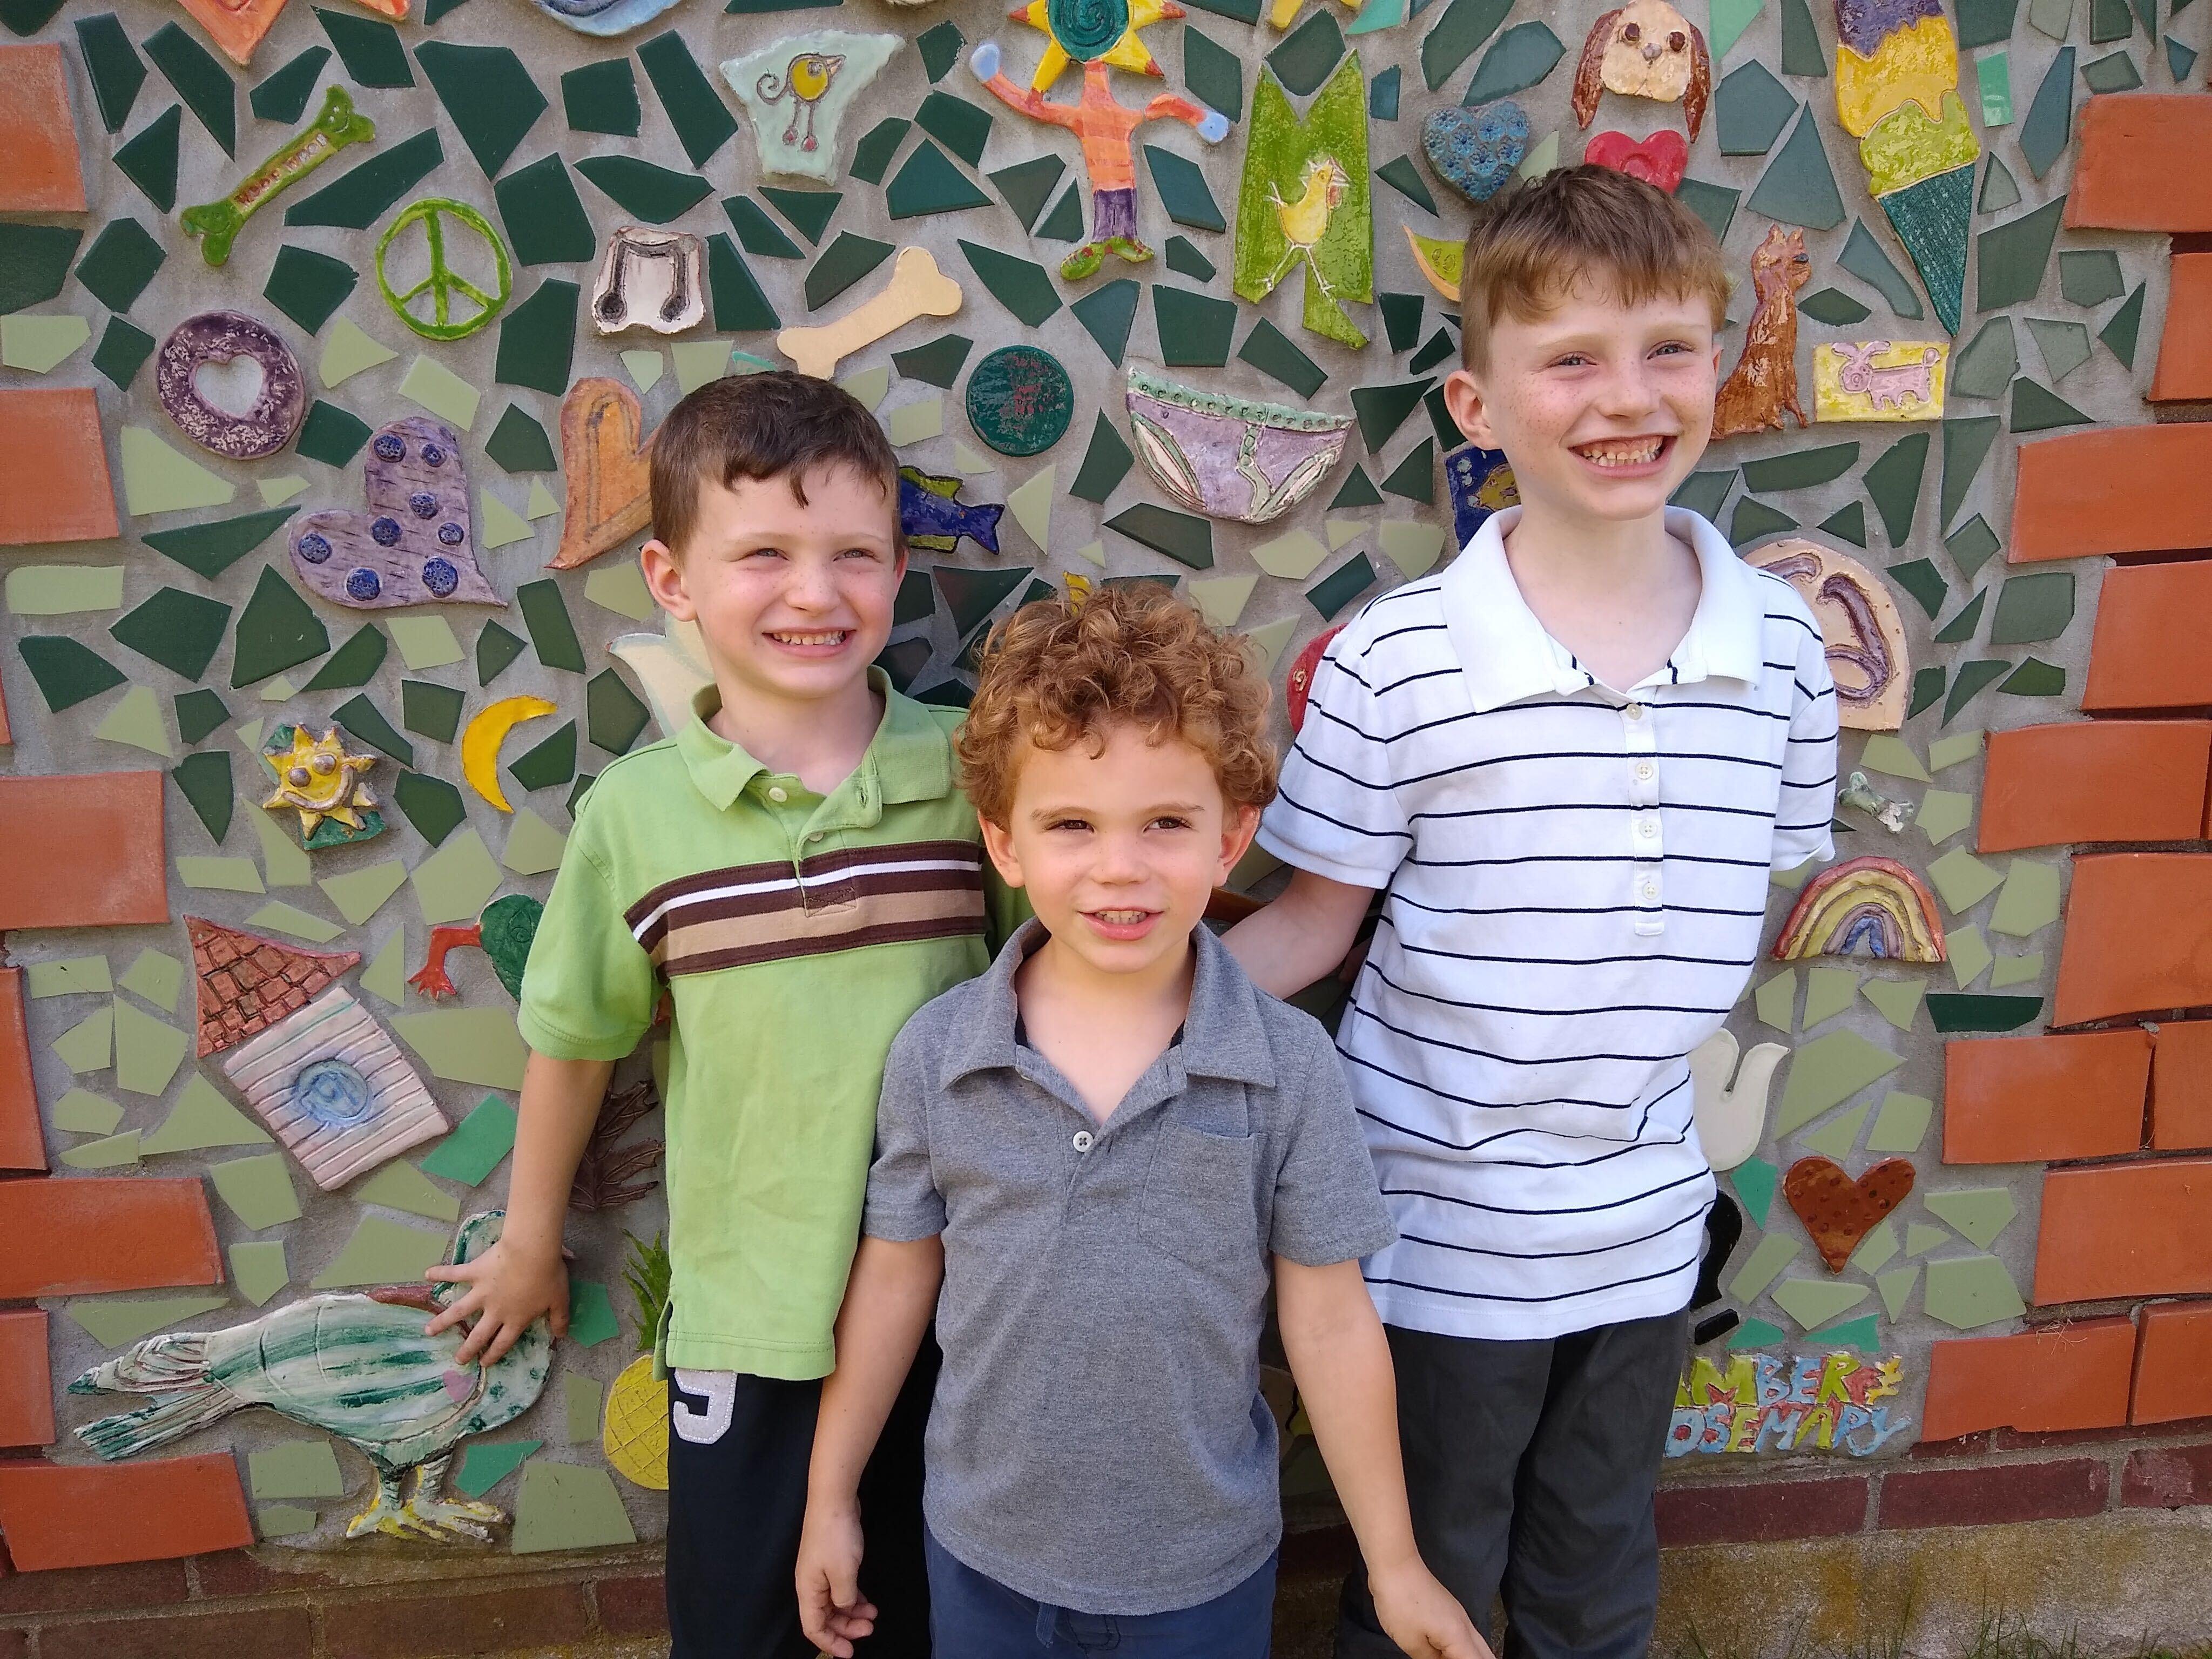 Laura Hoover's children, Nathan, Austin and Wyatt